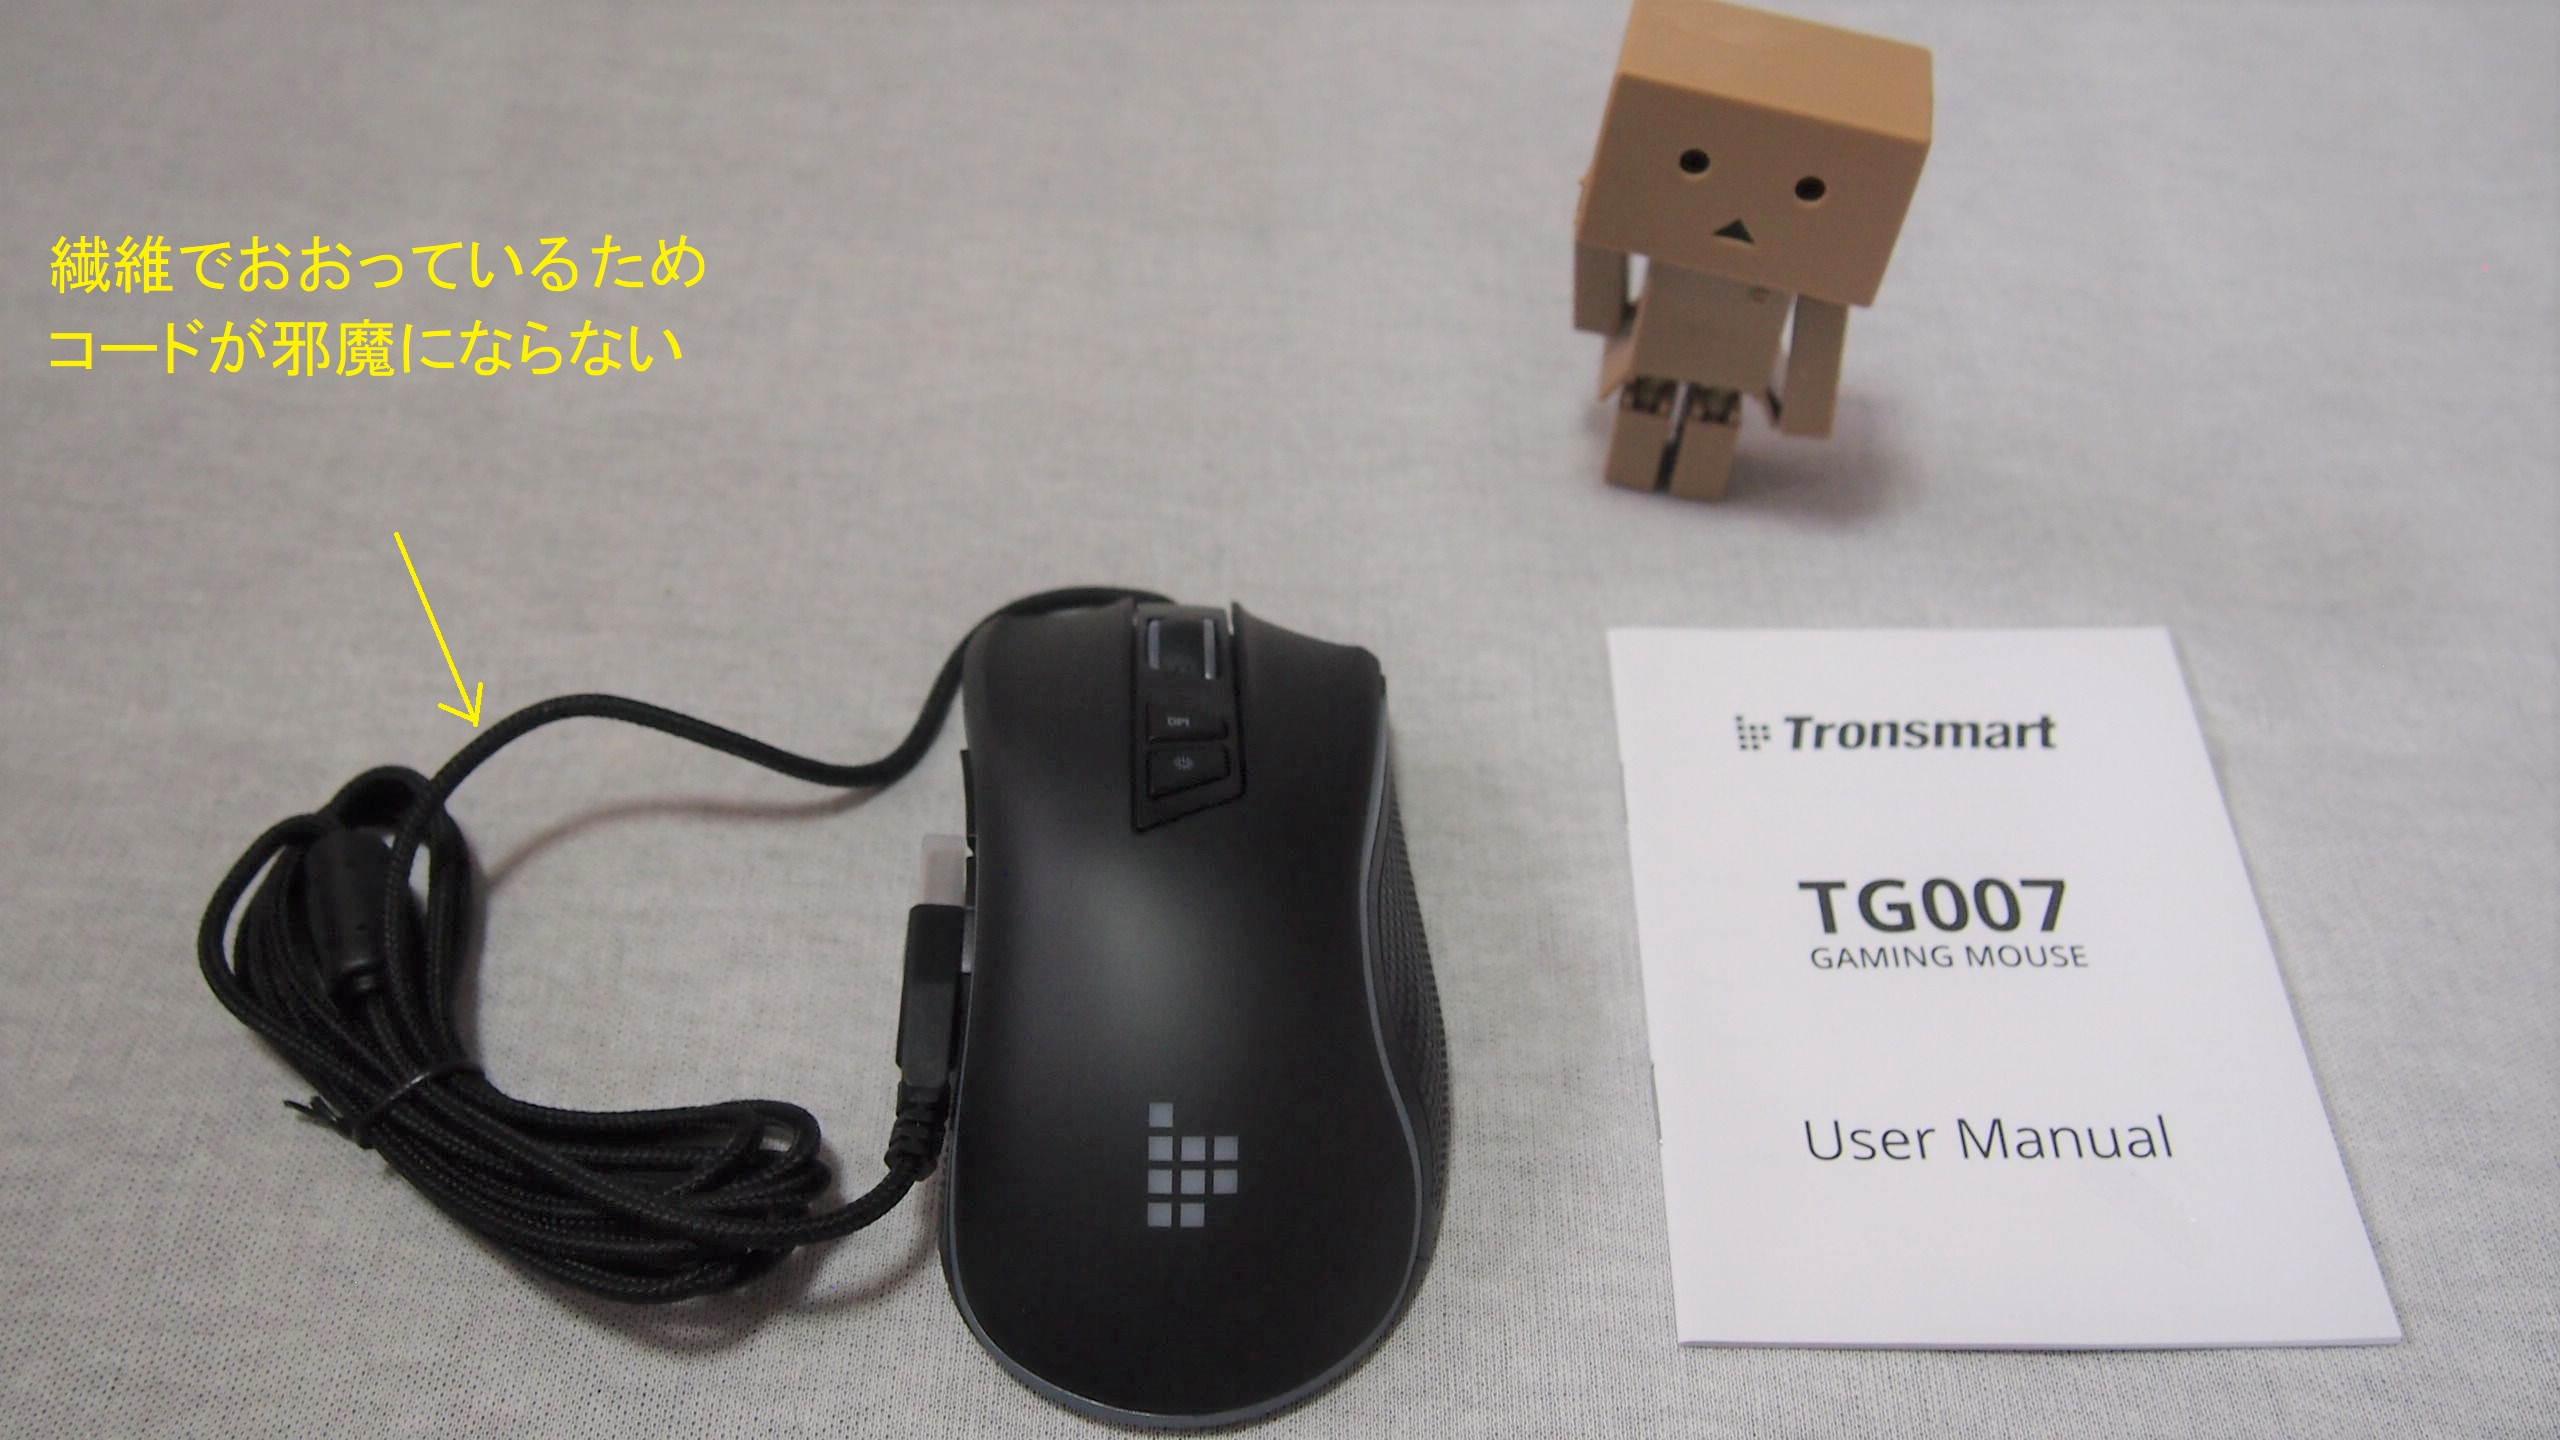 Tronsmart ゲーミングマウスTG007